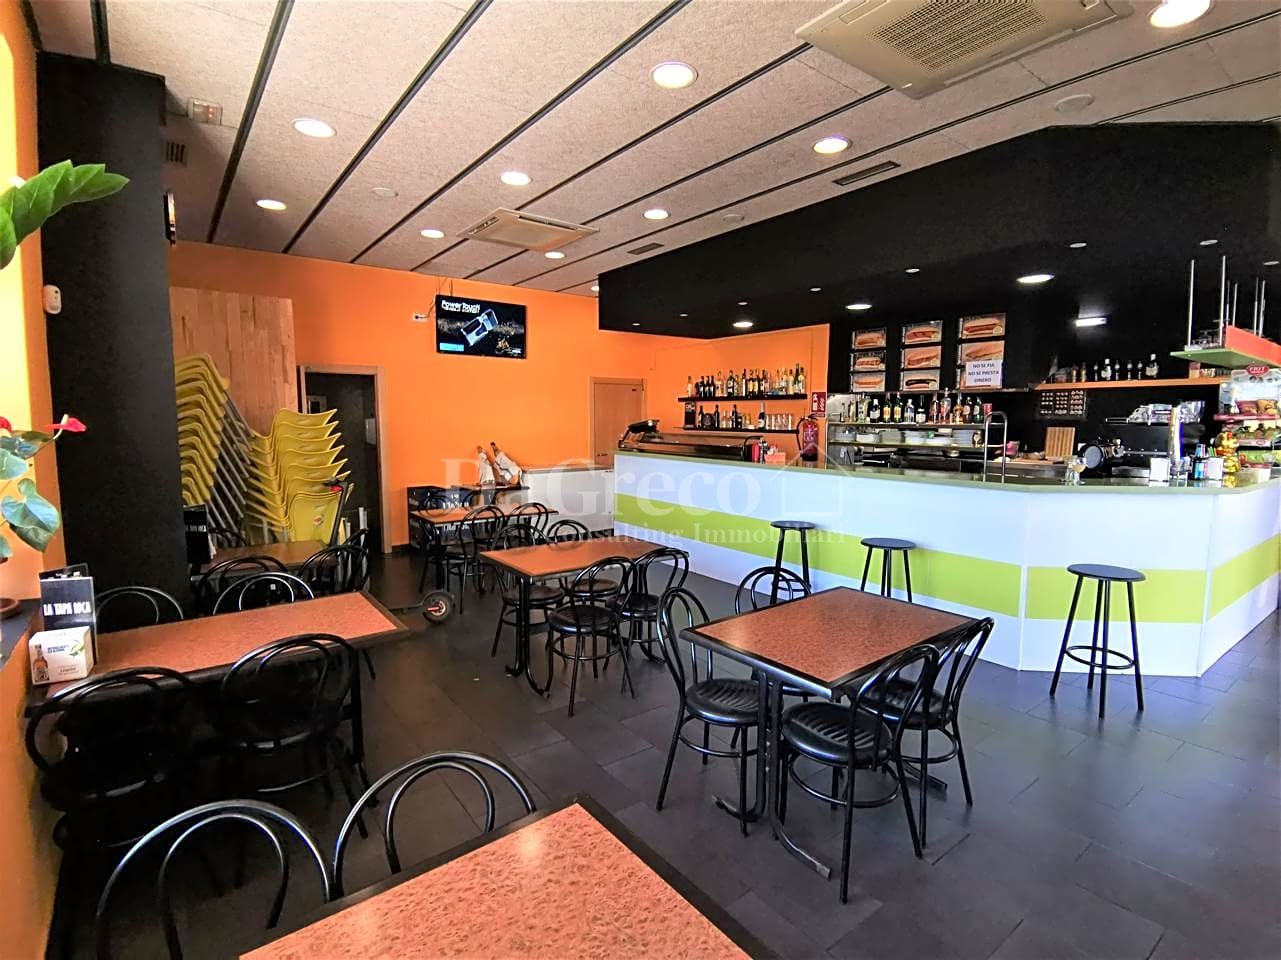 Lloguer Local Comercial  Via europa. Bar frankfurt en traspaso en Mataró, zona via europa. es un loc